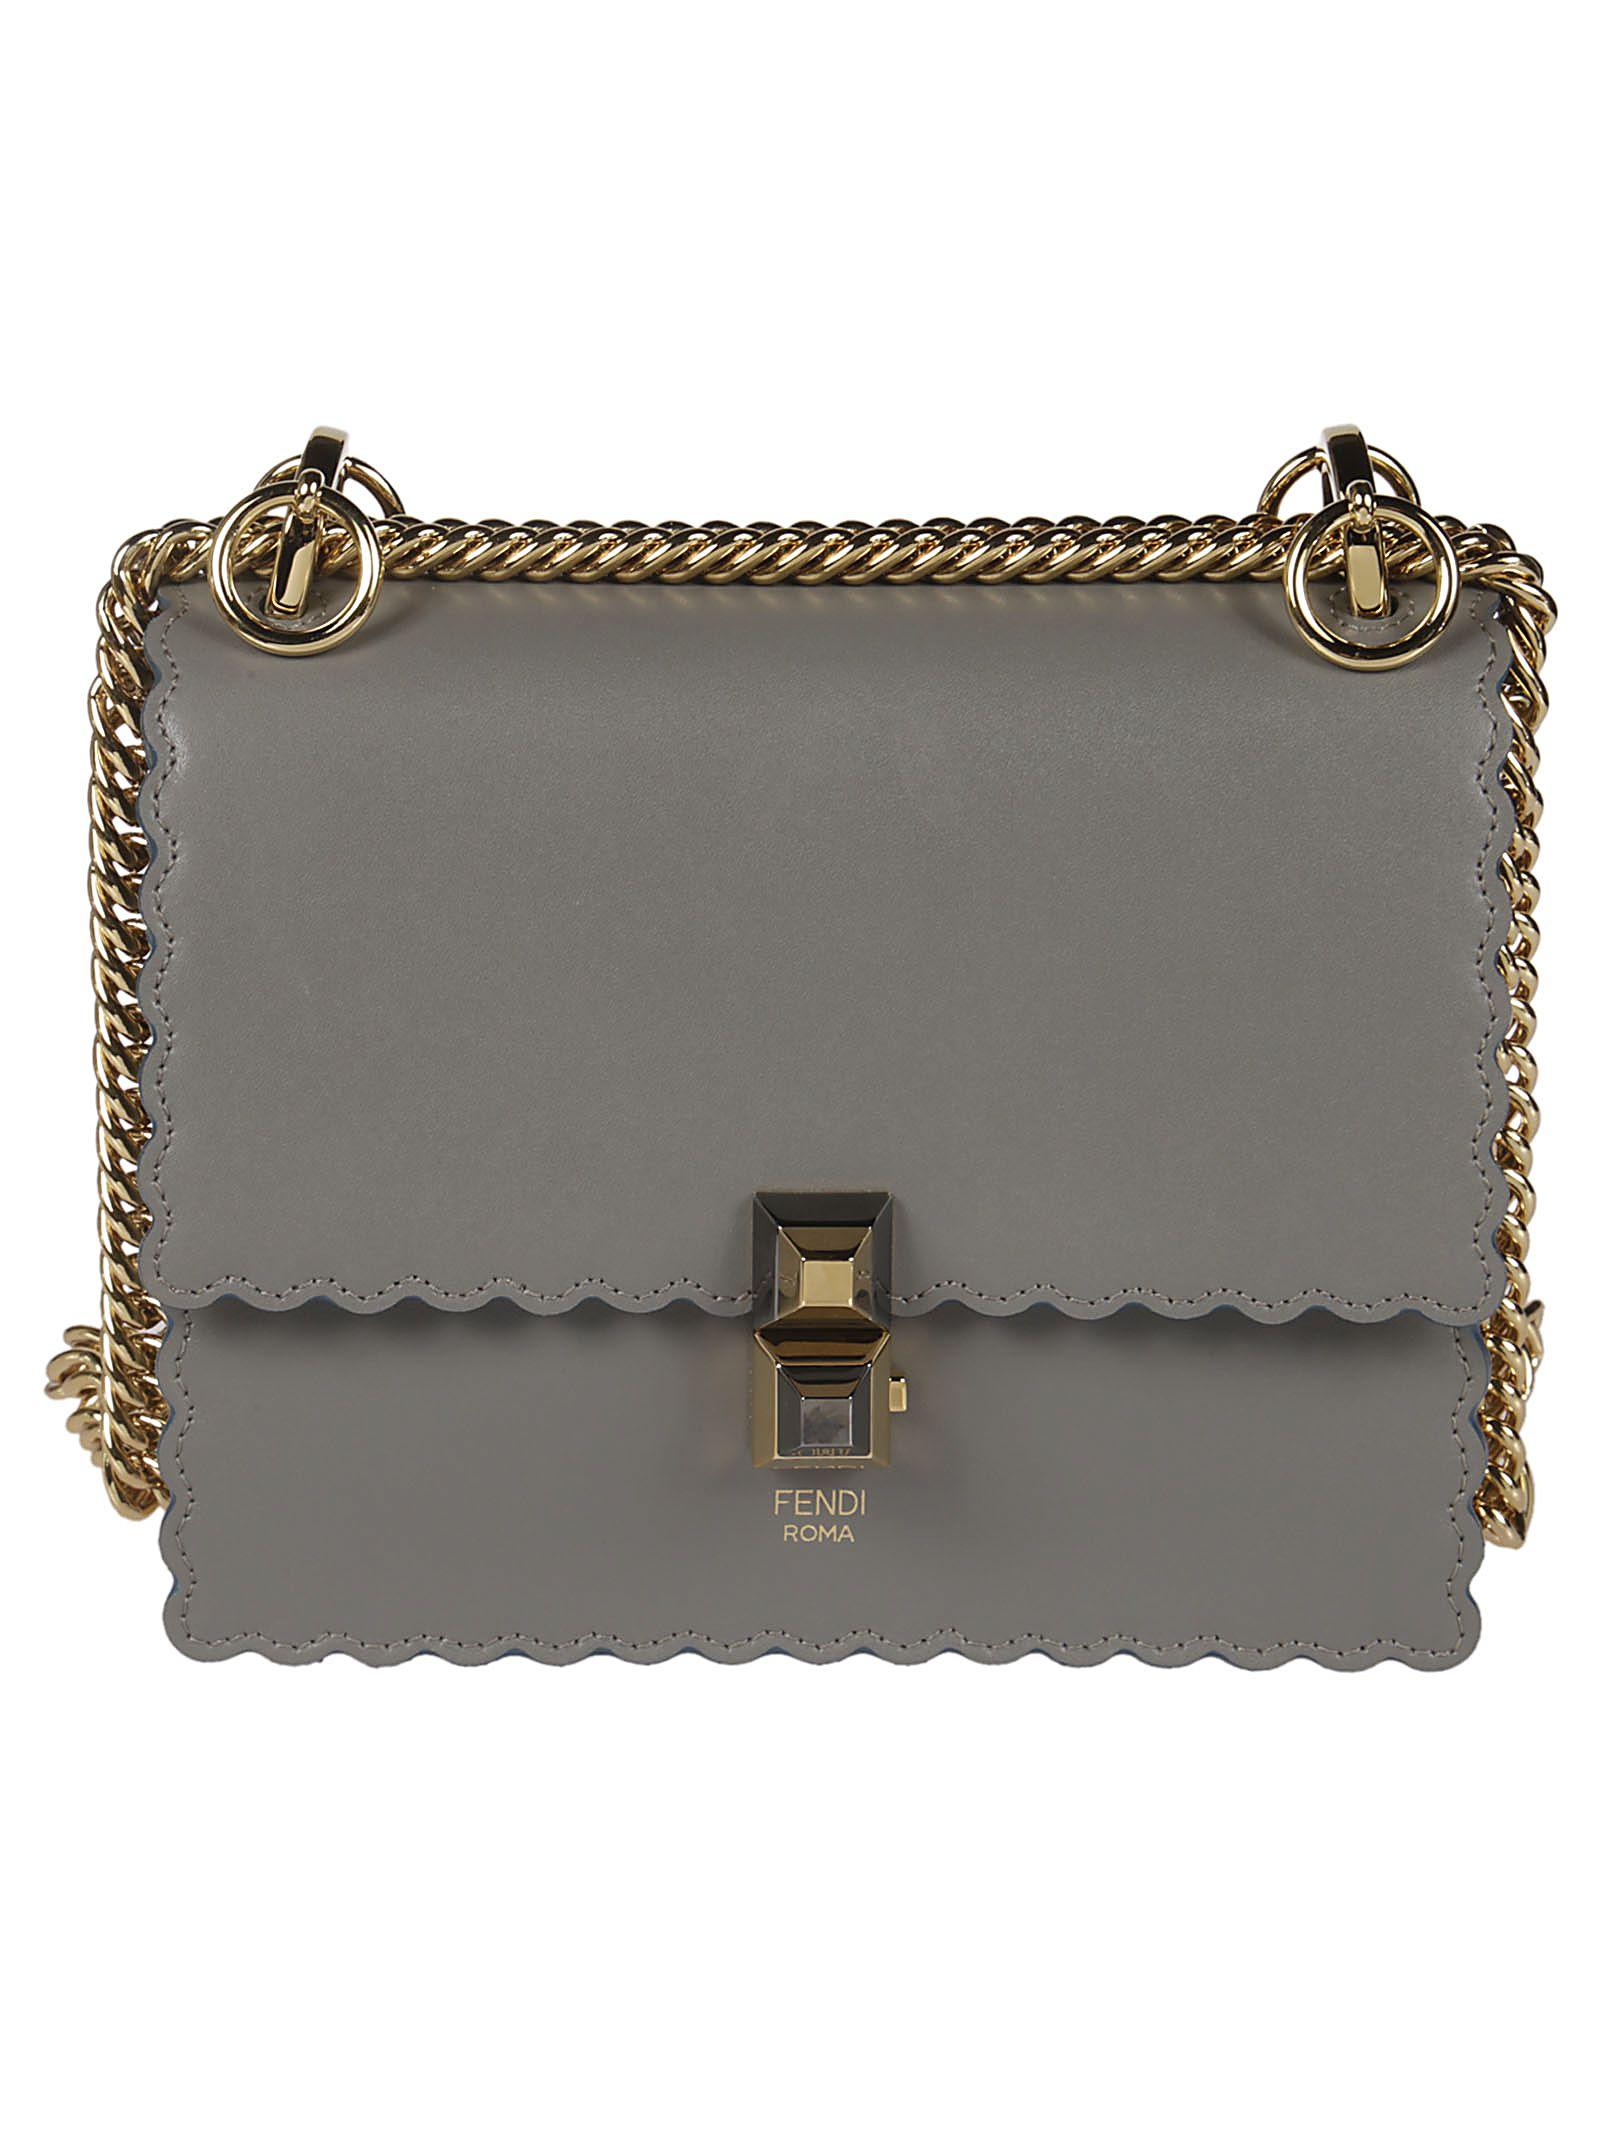 57b5065f8e50 Fendi Fendi Scalloped Shoulder Bag - argil - 10805948